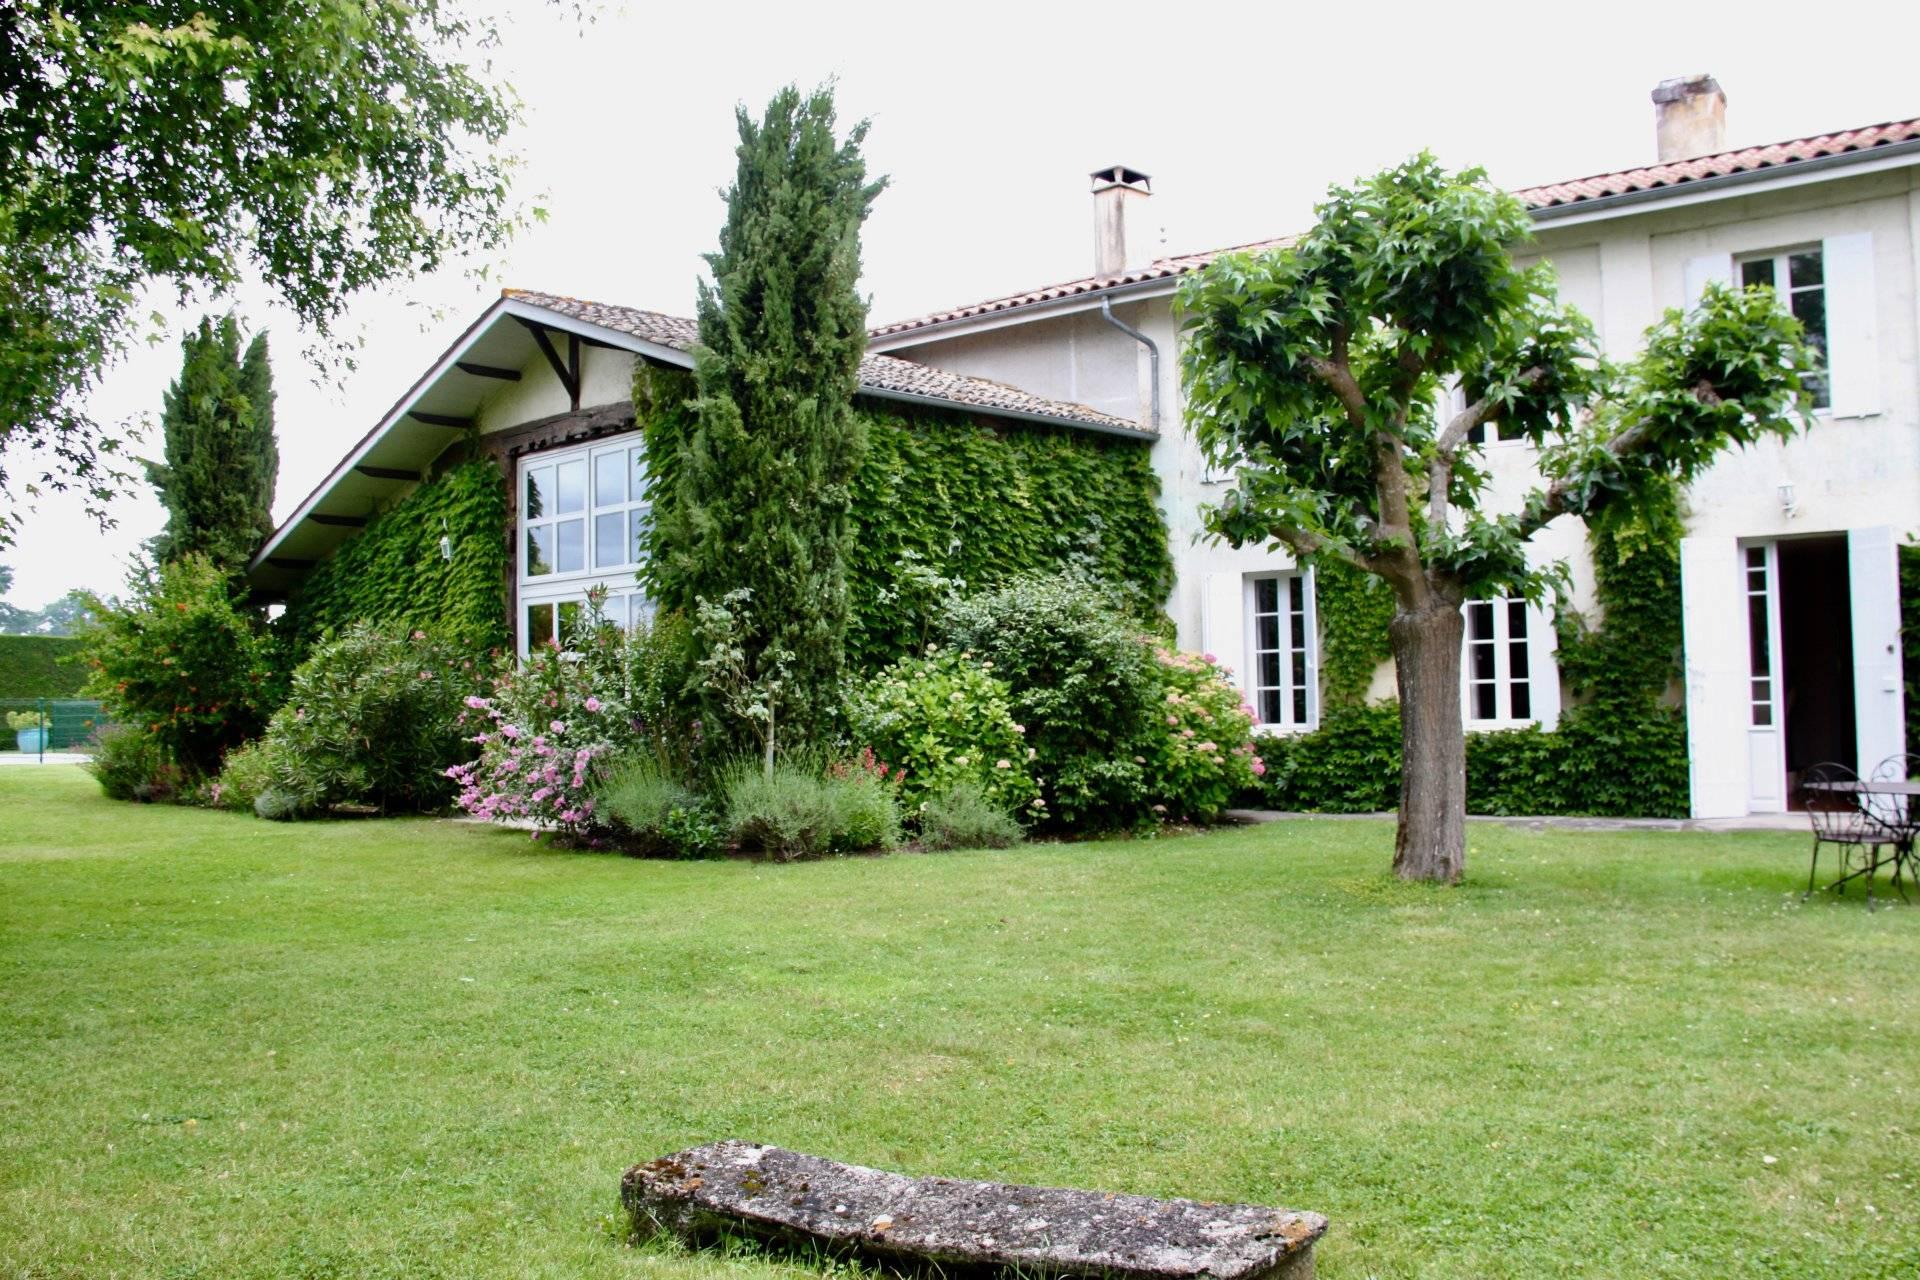 Jolie maison girondine avec piscine a vendre PROCHE BORDEAUX